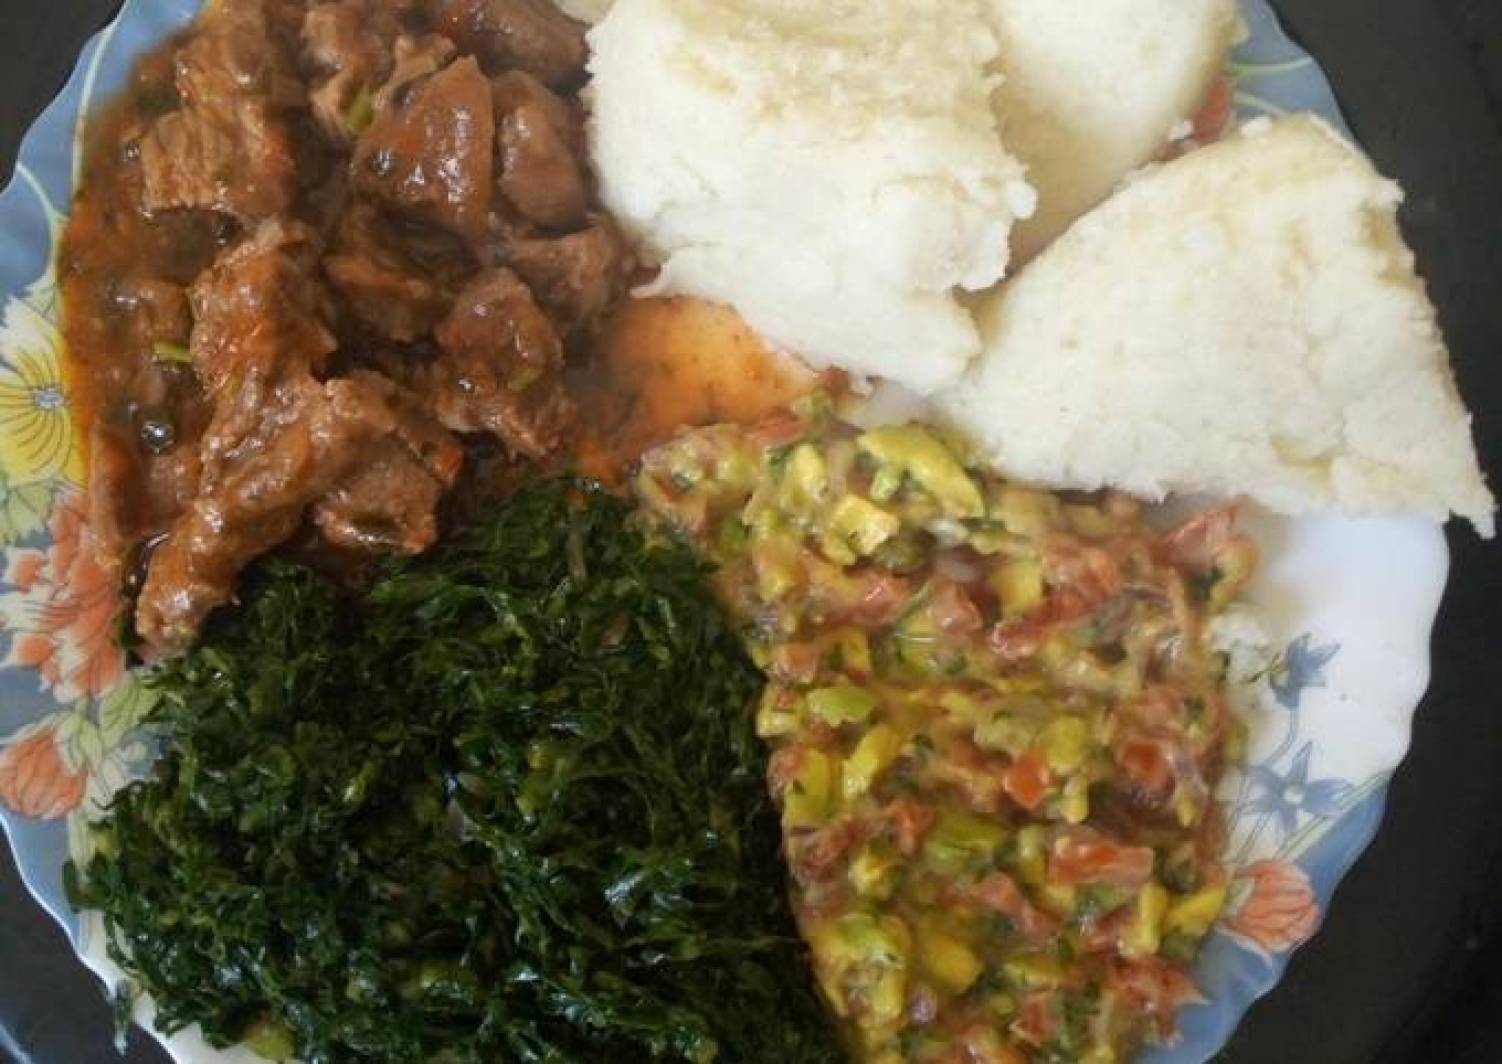 Ugali and greens with fried meat and kachumbari#4weekchallenge